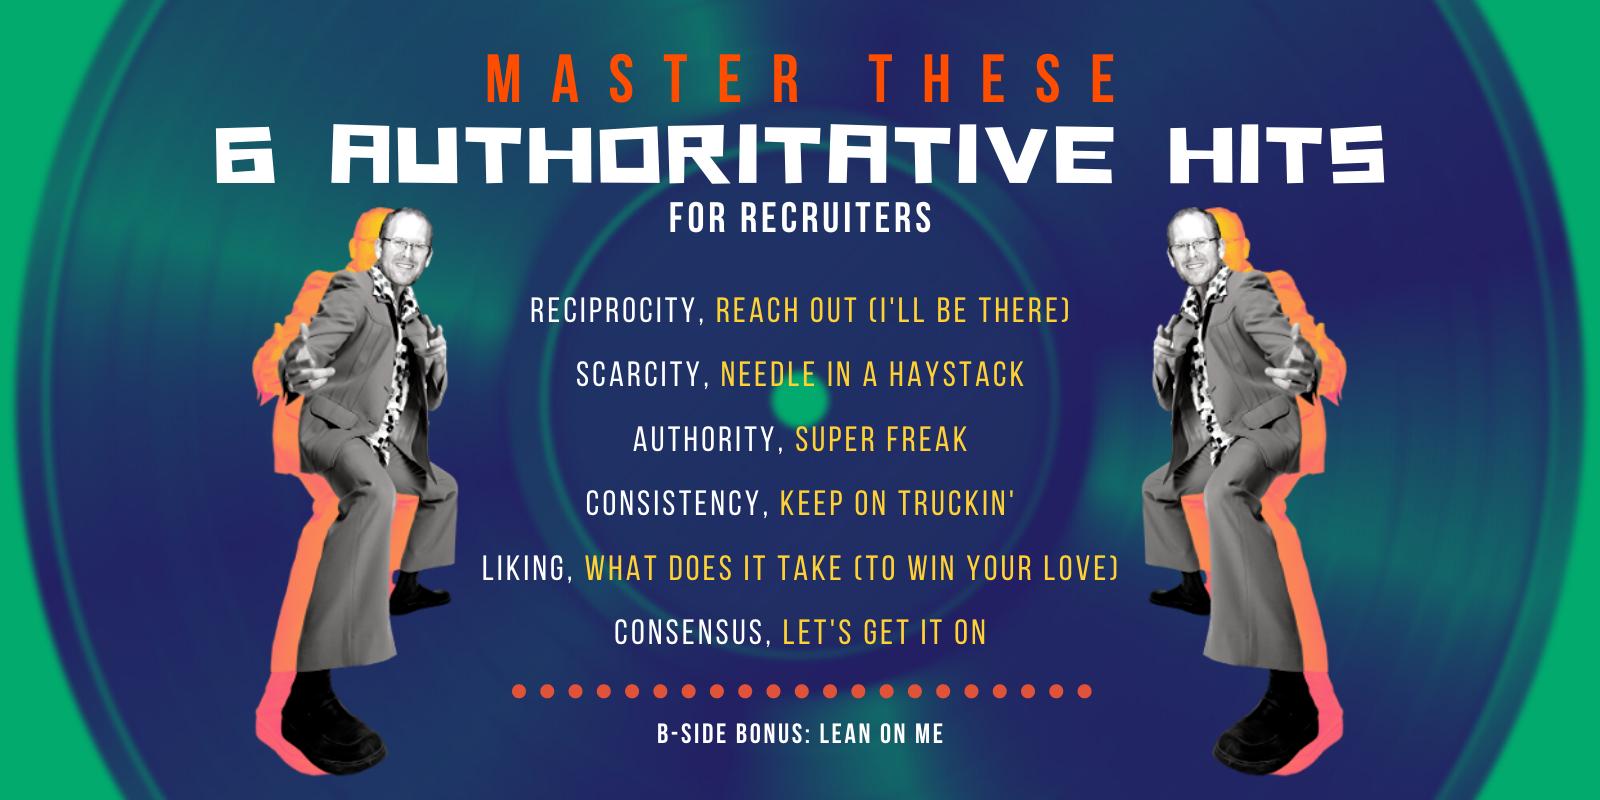 6 Authoritative Hits for Recruiters